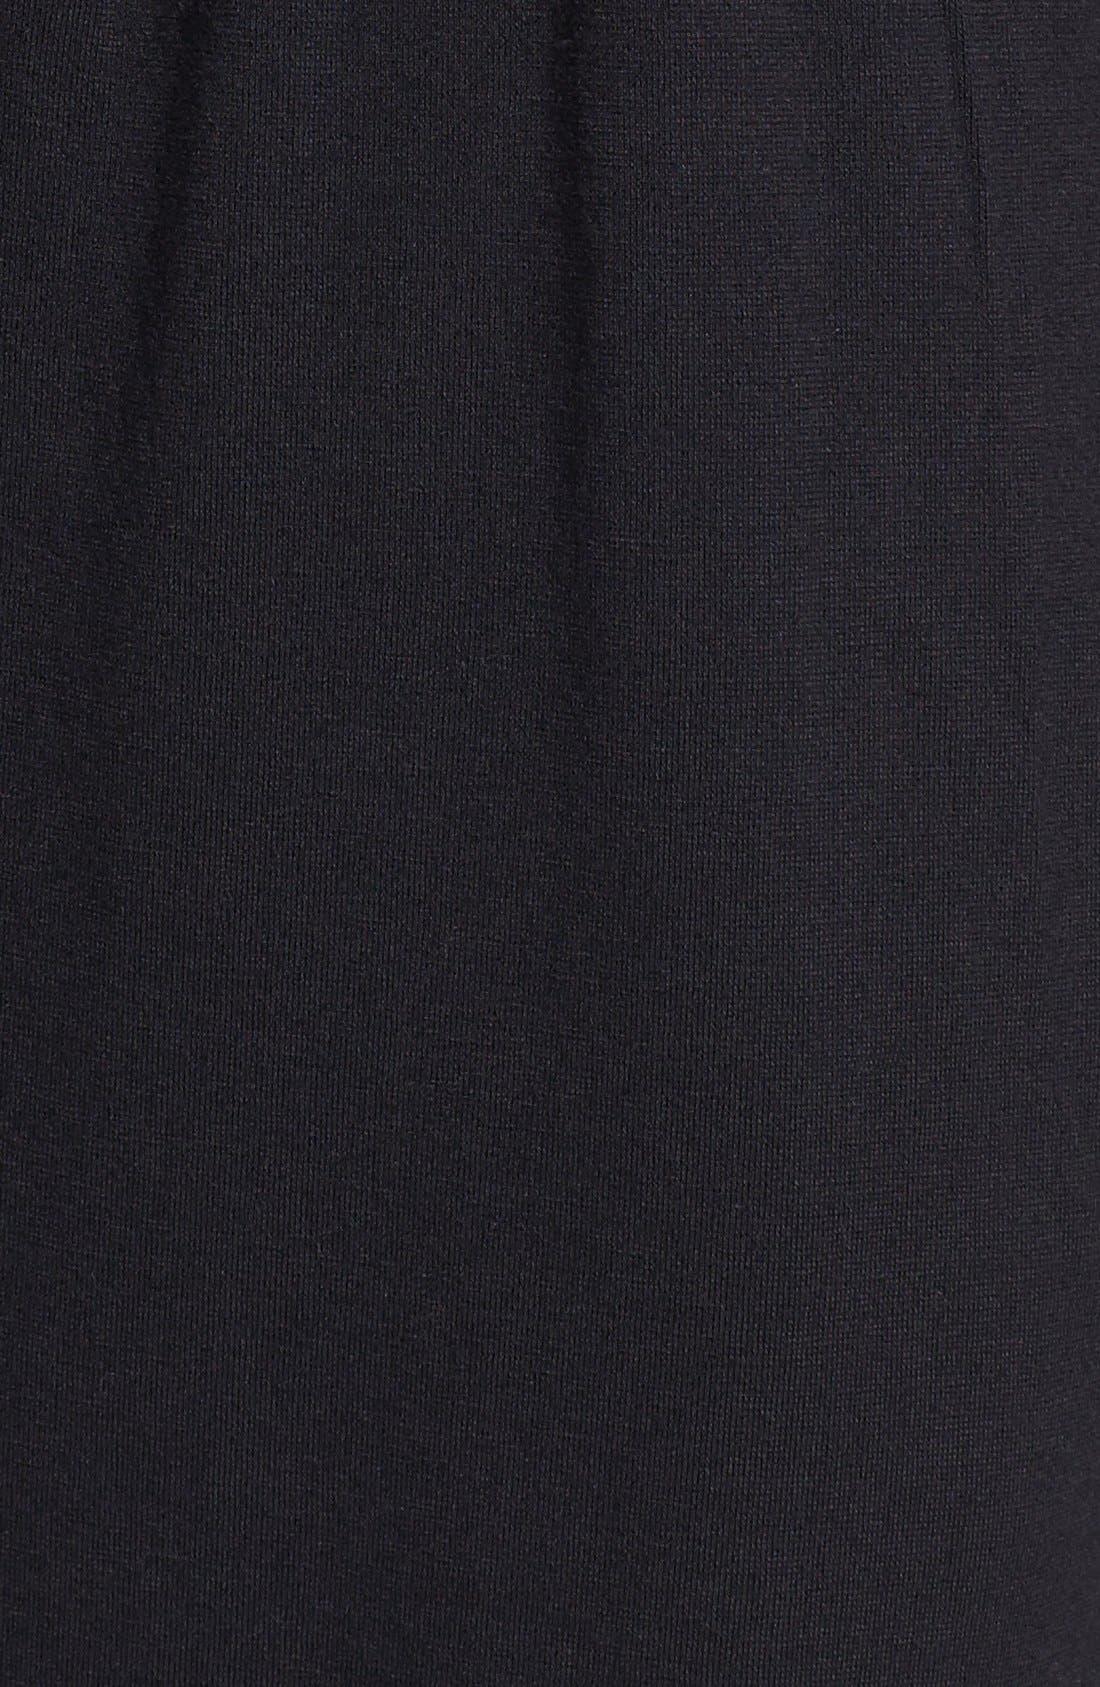 Alternate Image 5  - OMGIRL 'Tranquility' Capri Pants